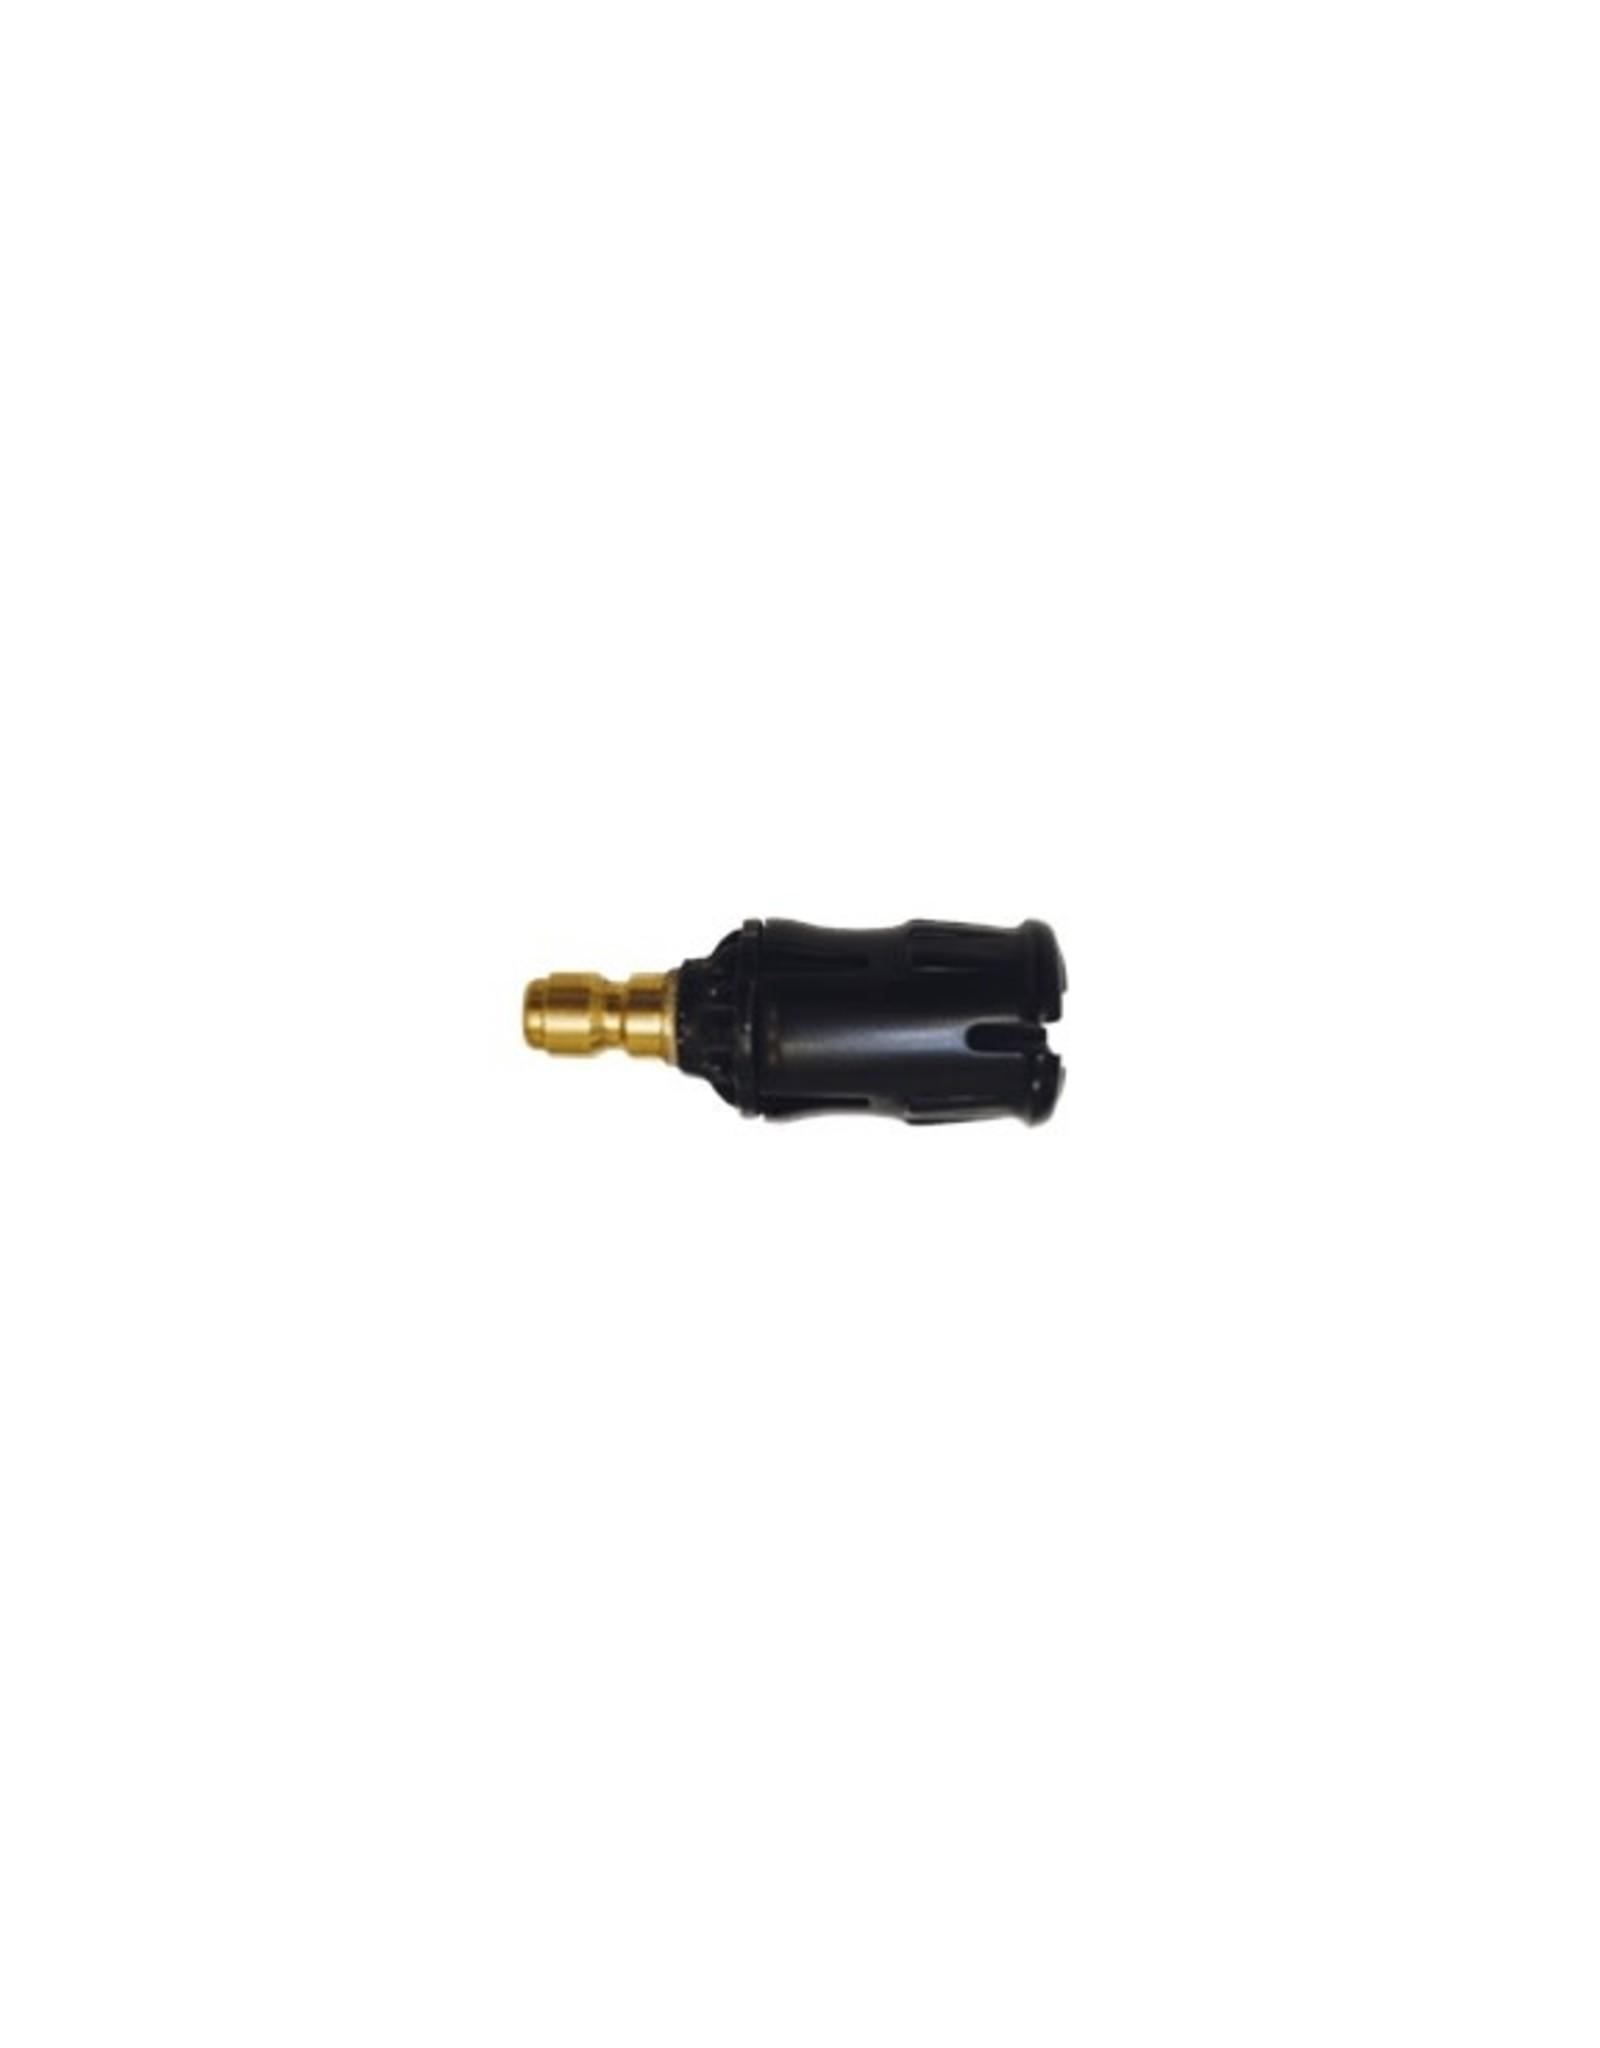 BE 85.210.009 Long Range Soaper Nozzle